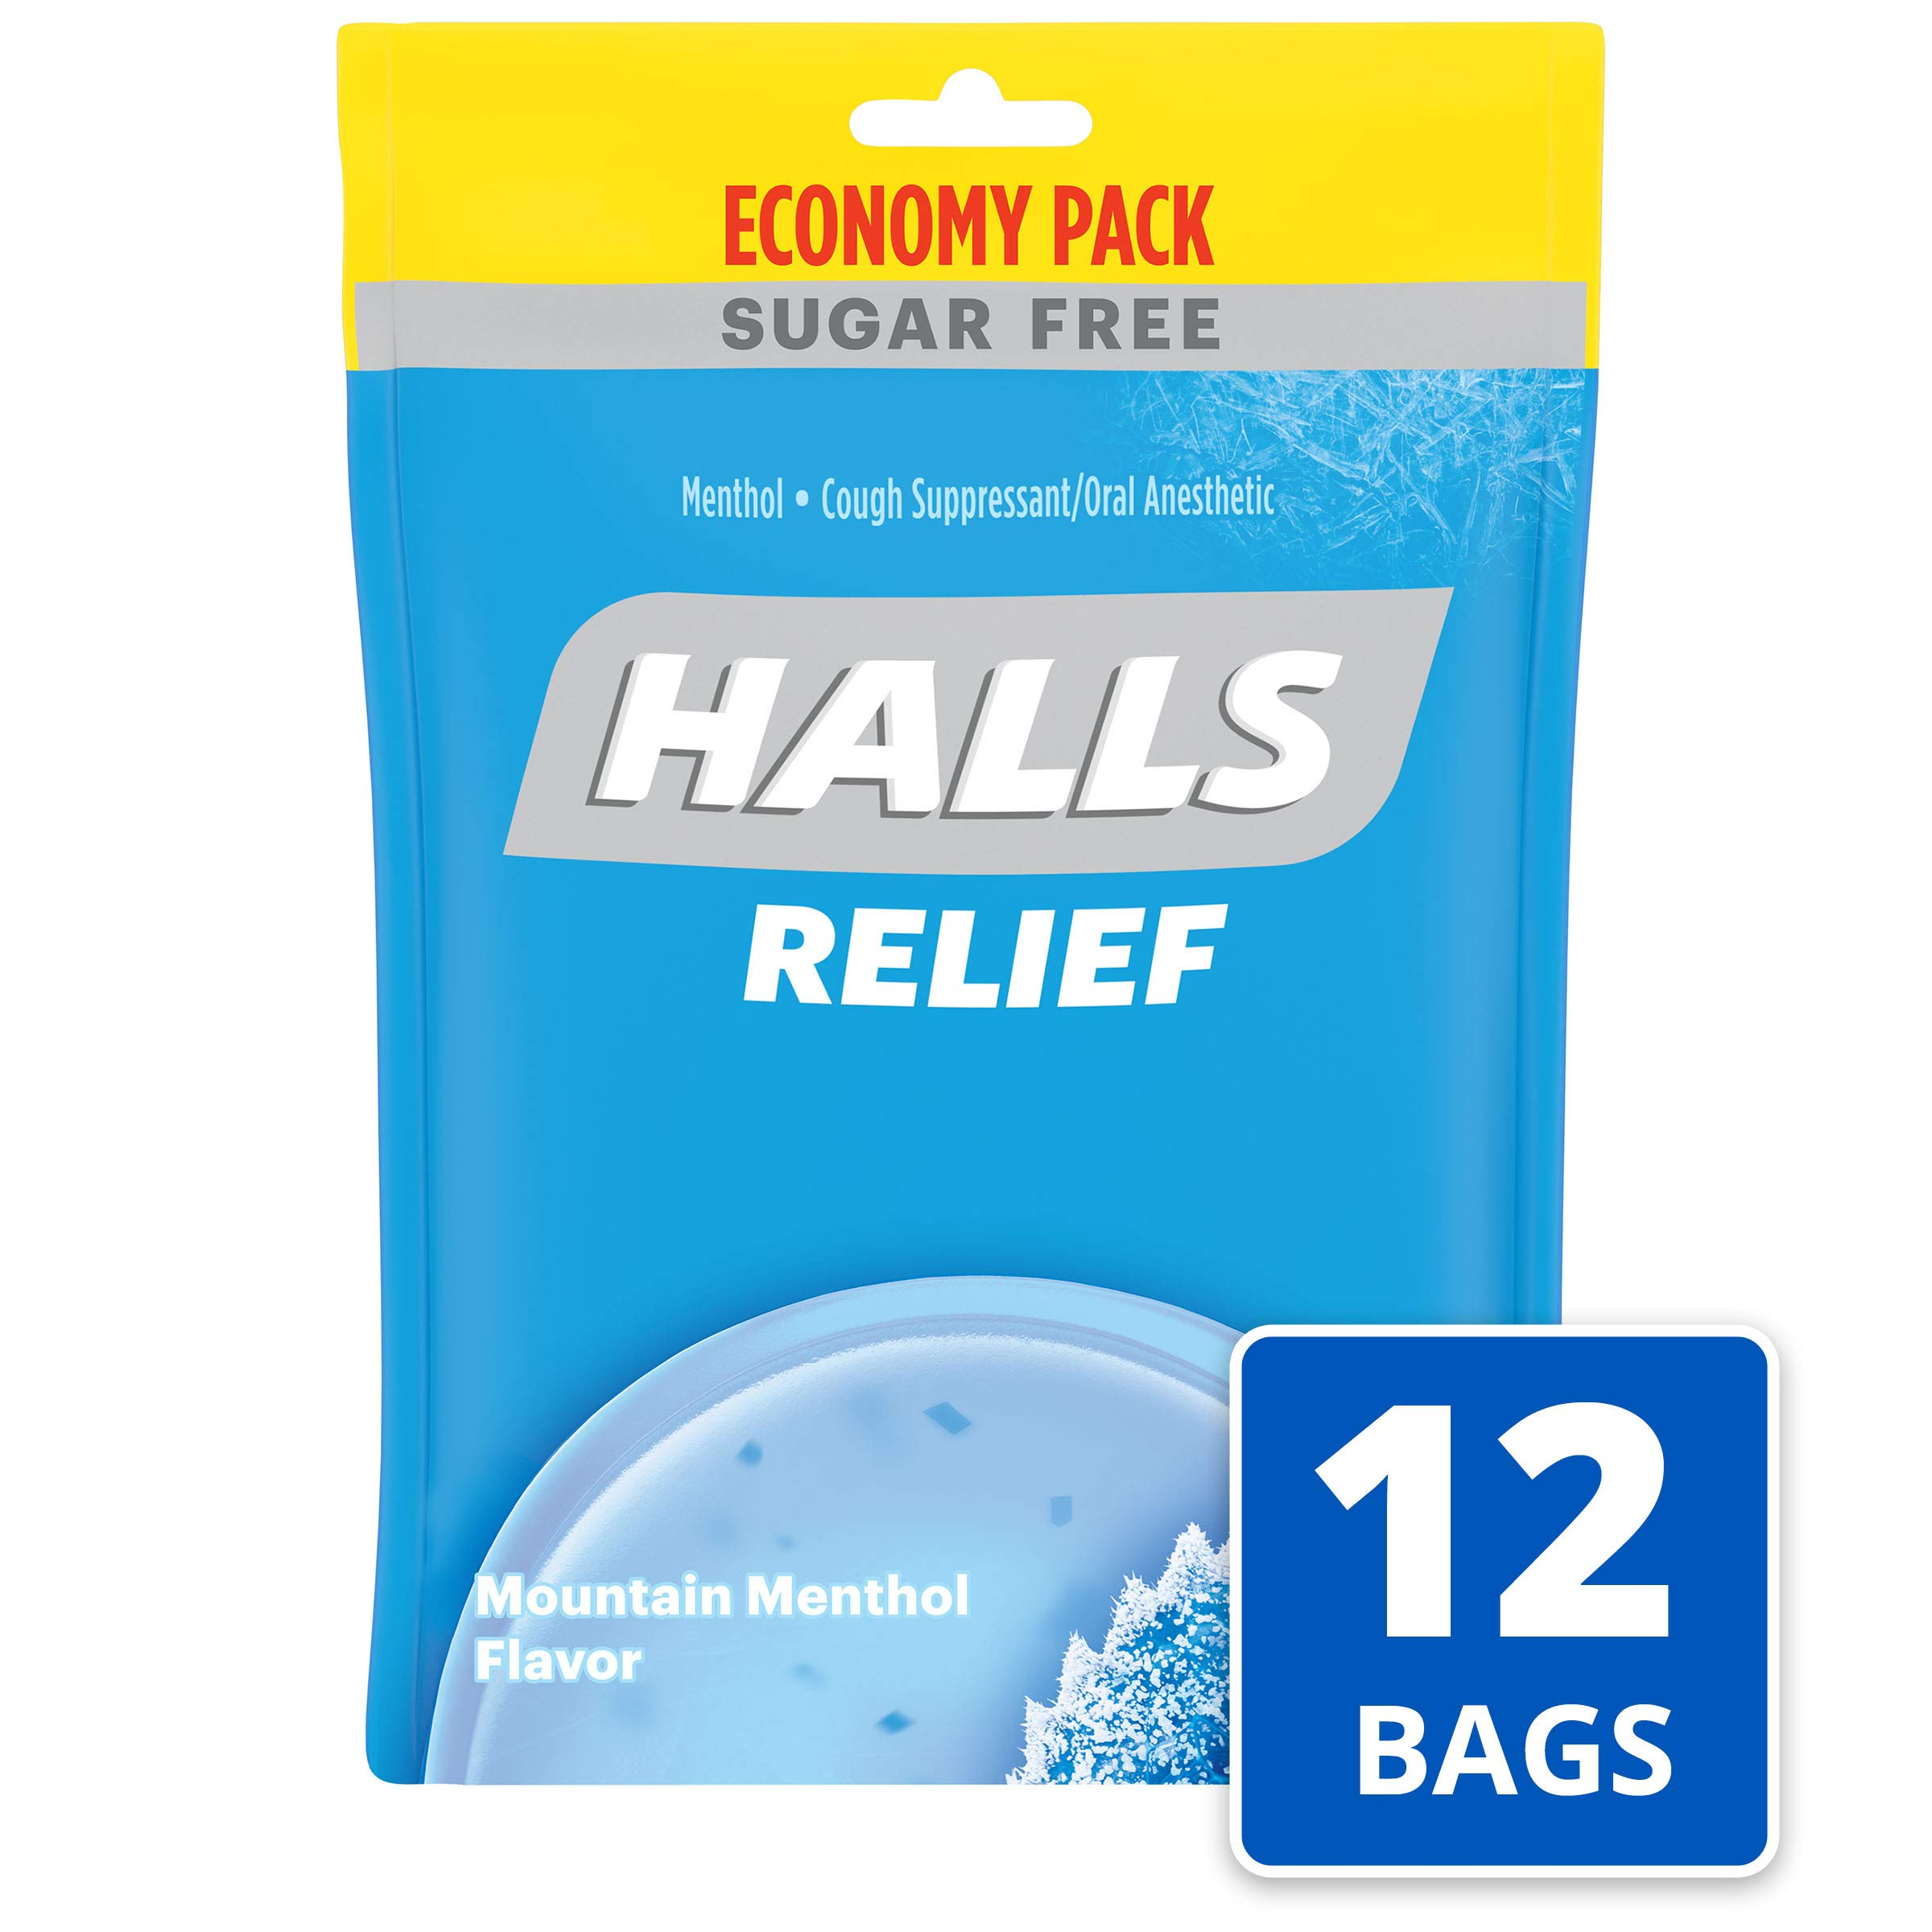 Halls Mountain Menthol Sugar Free Cough Drops - Bulk Pack - 840 Drops (12 packs of 70 drops) by Halls